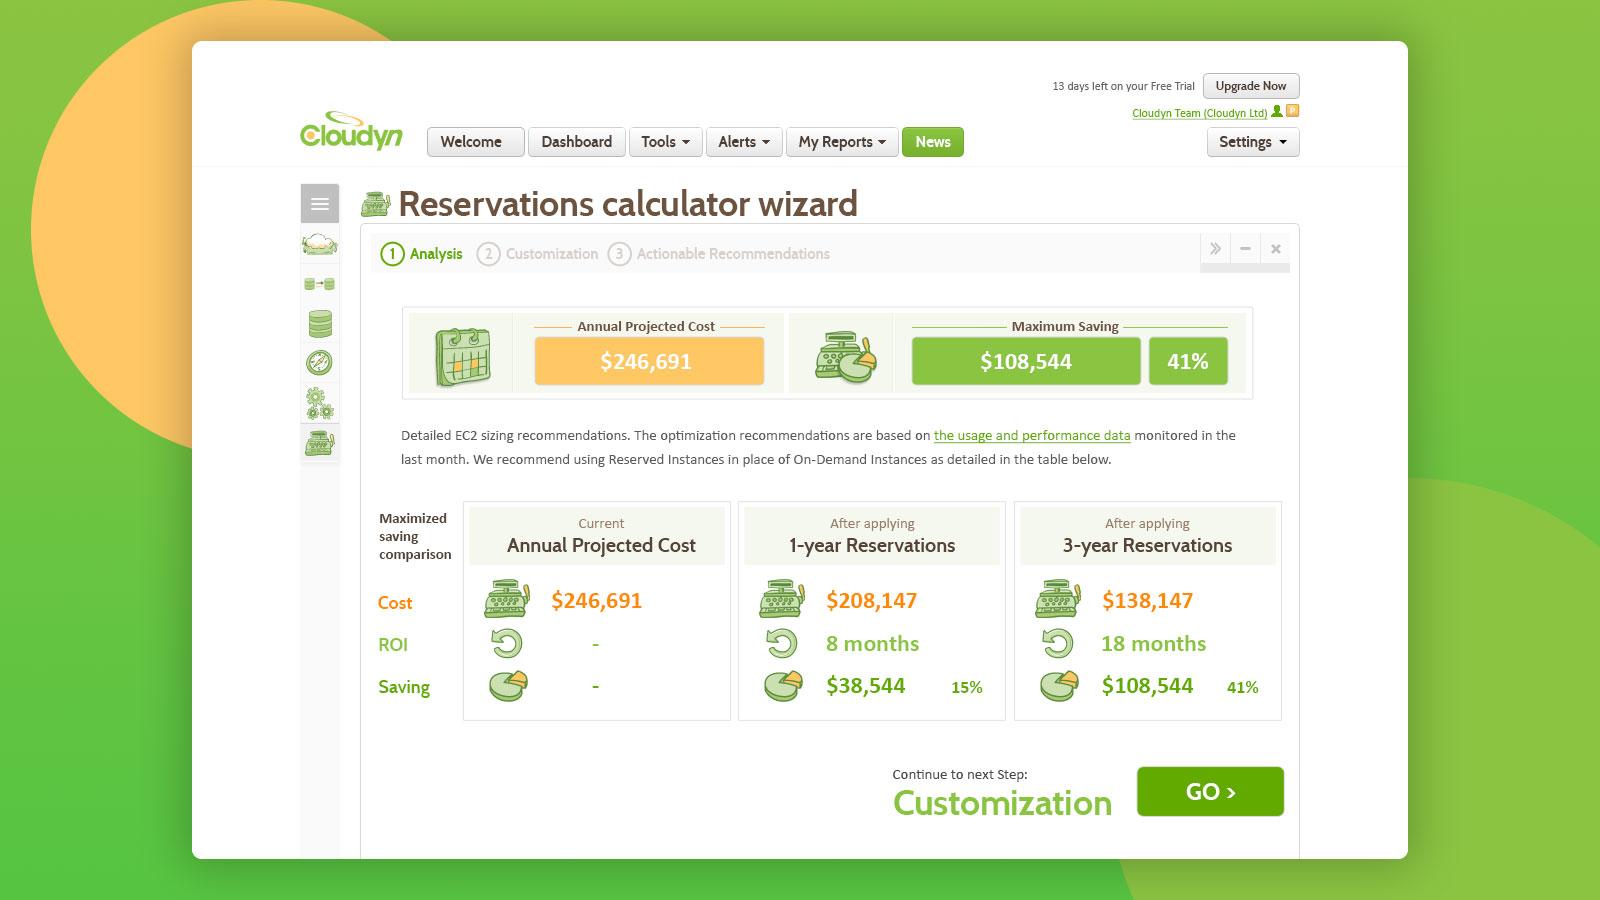 UI UX for web app עיצוב ממשק משתמש אפליקצייה קלאודין